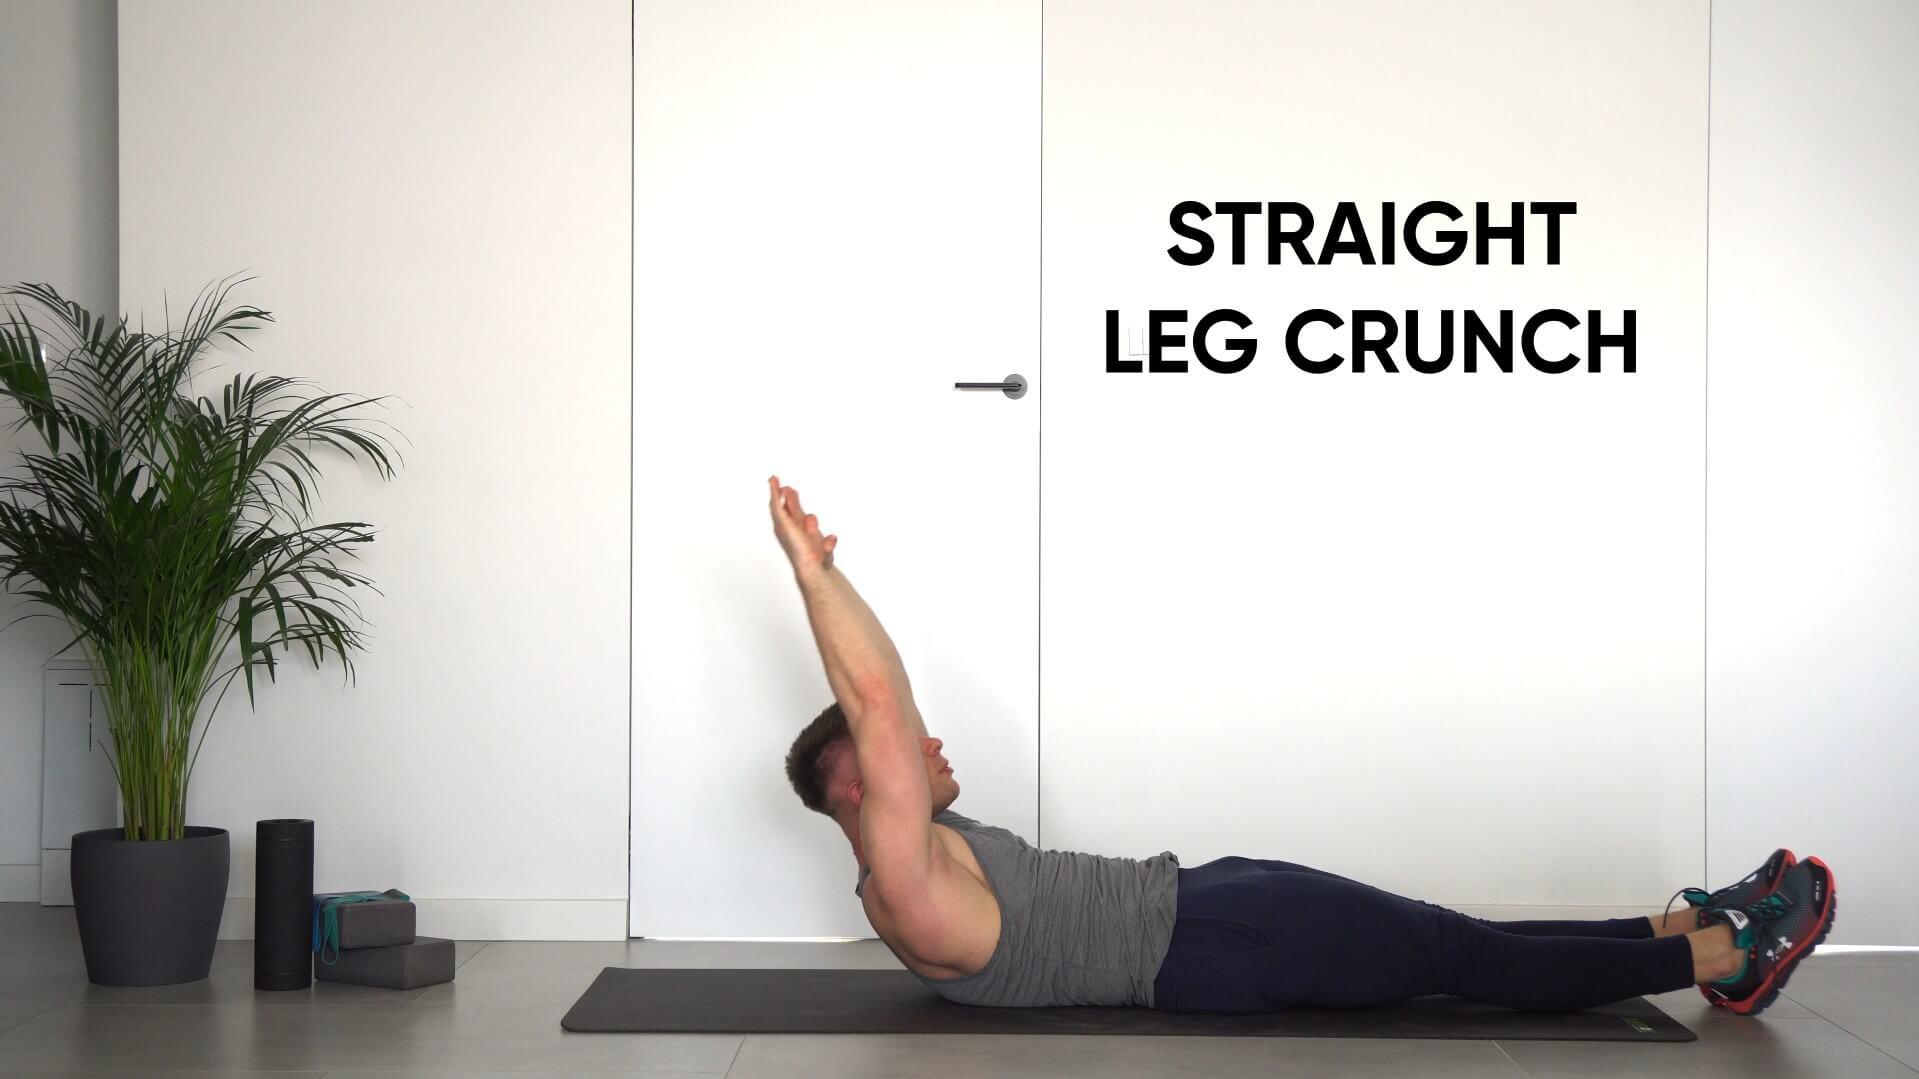 Straight leg crunch